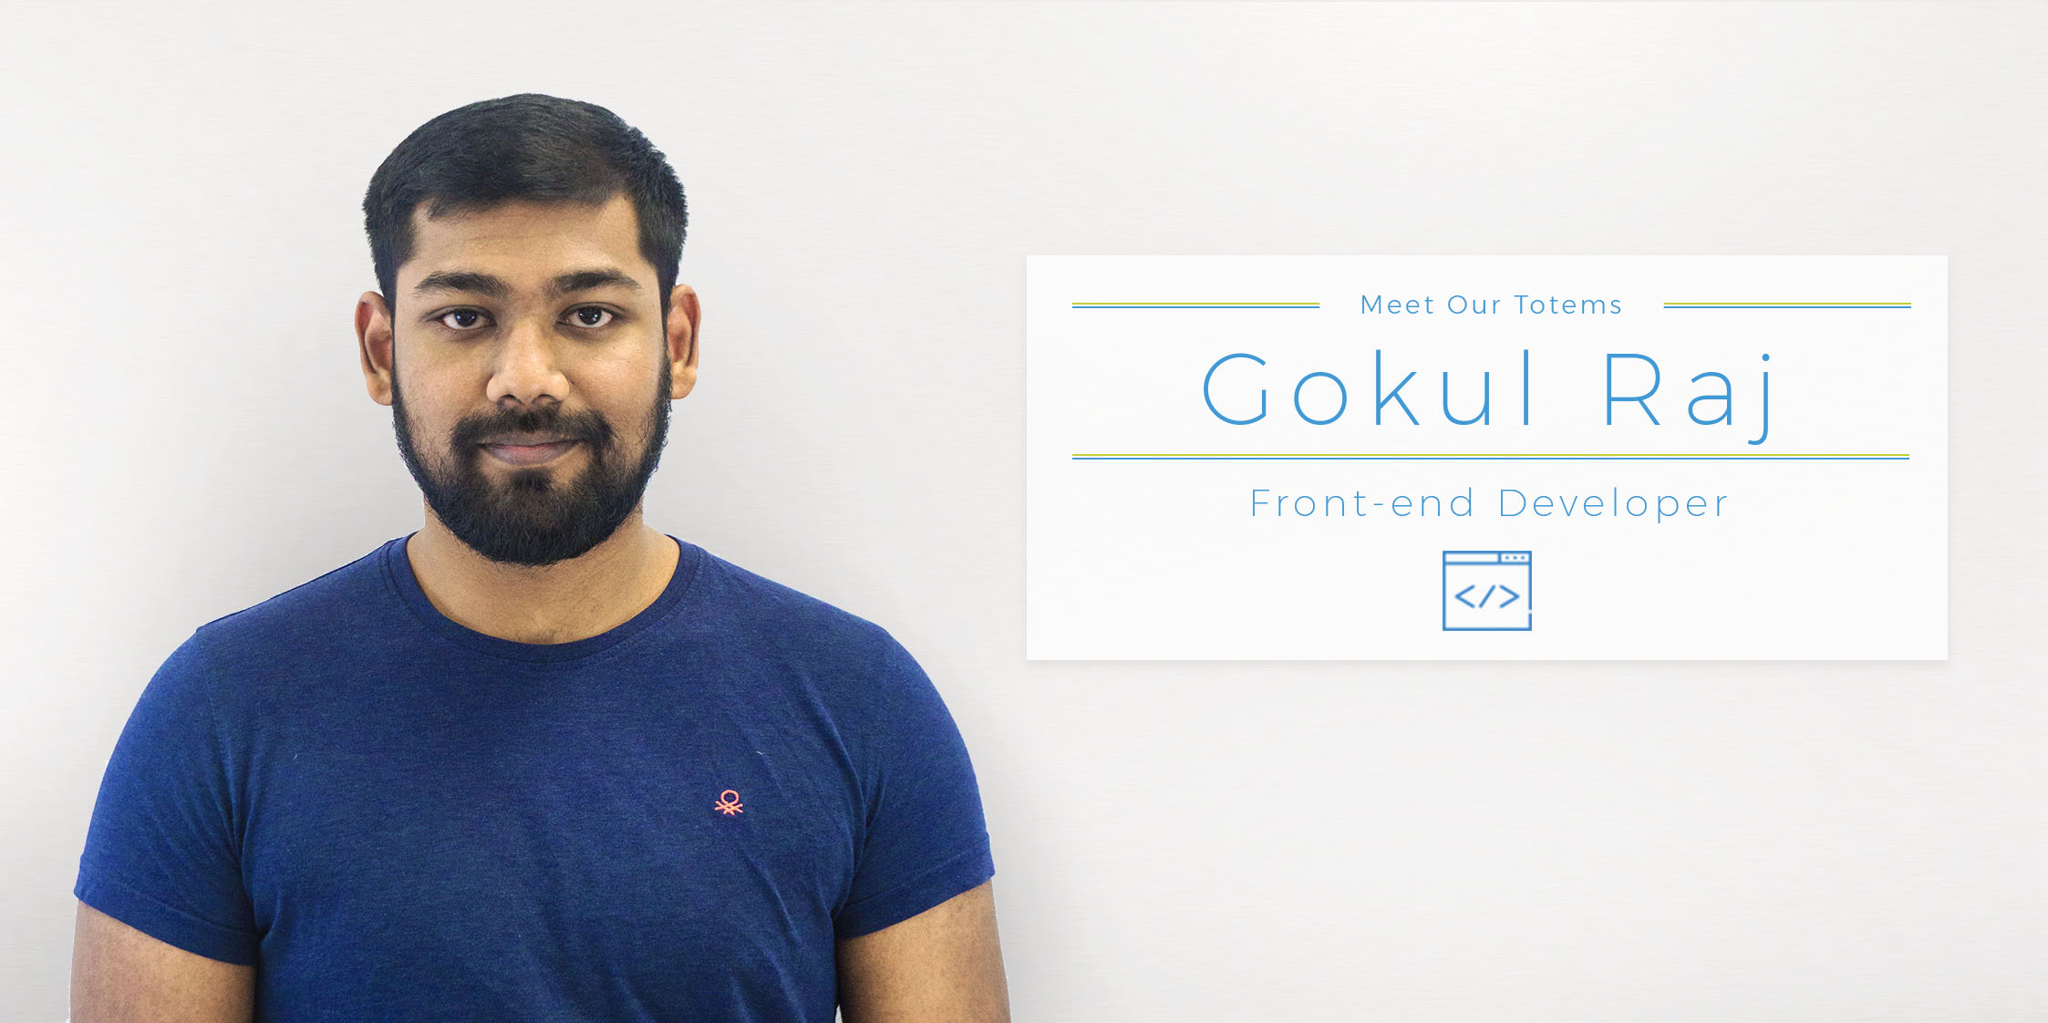 Meet Our Totems – Gokul